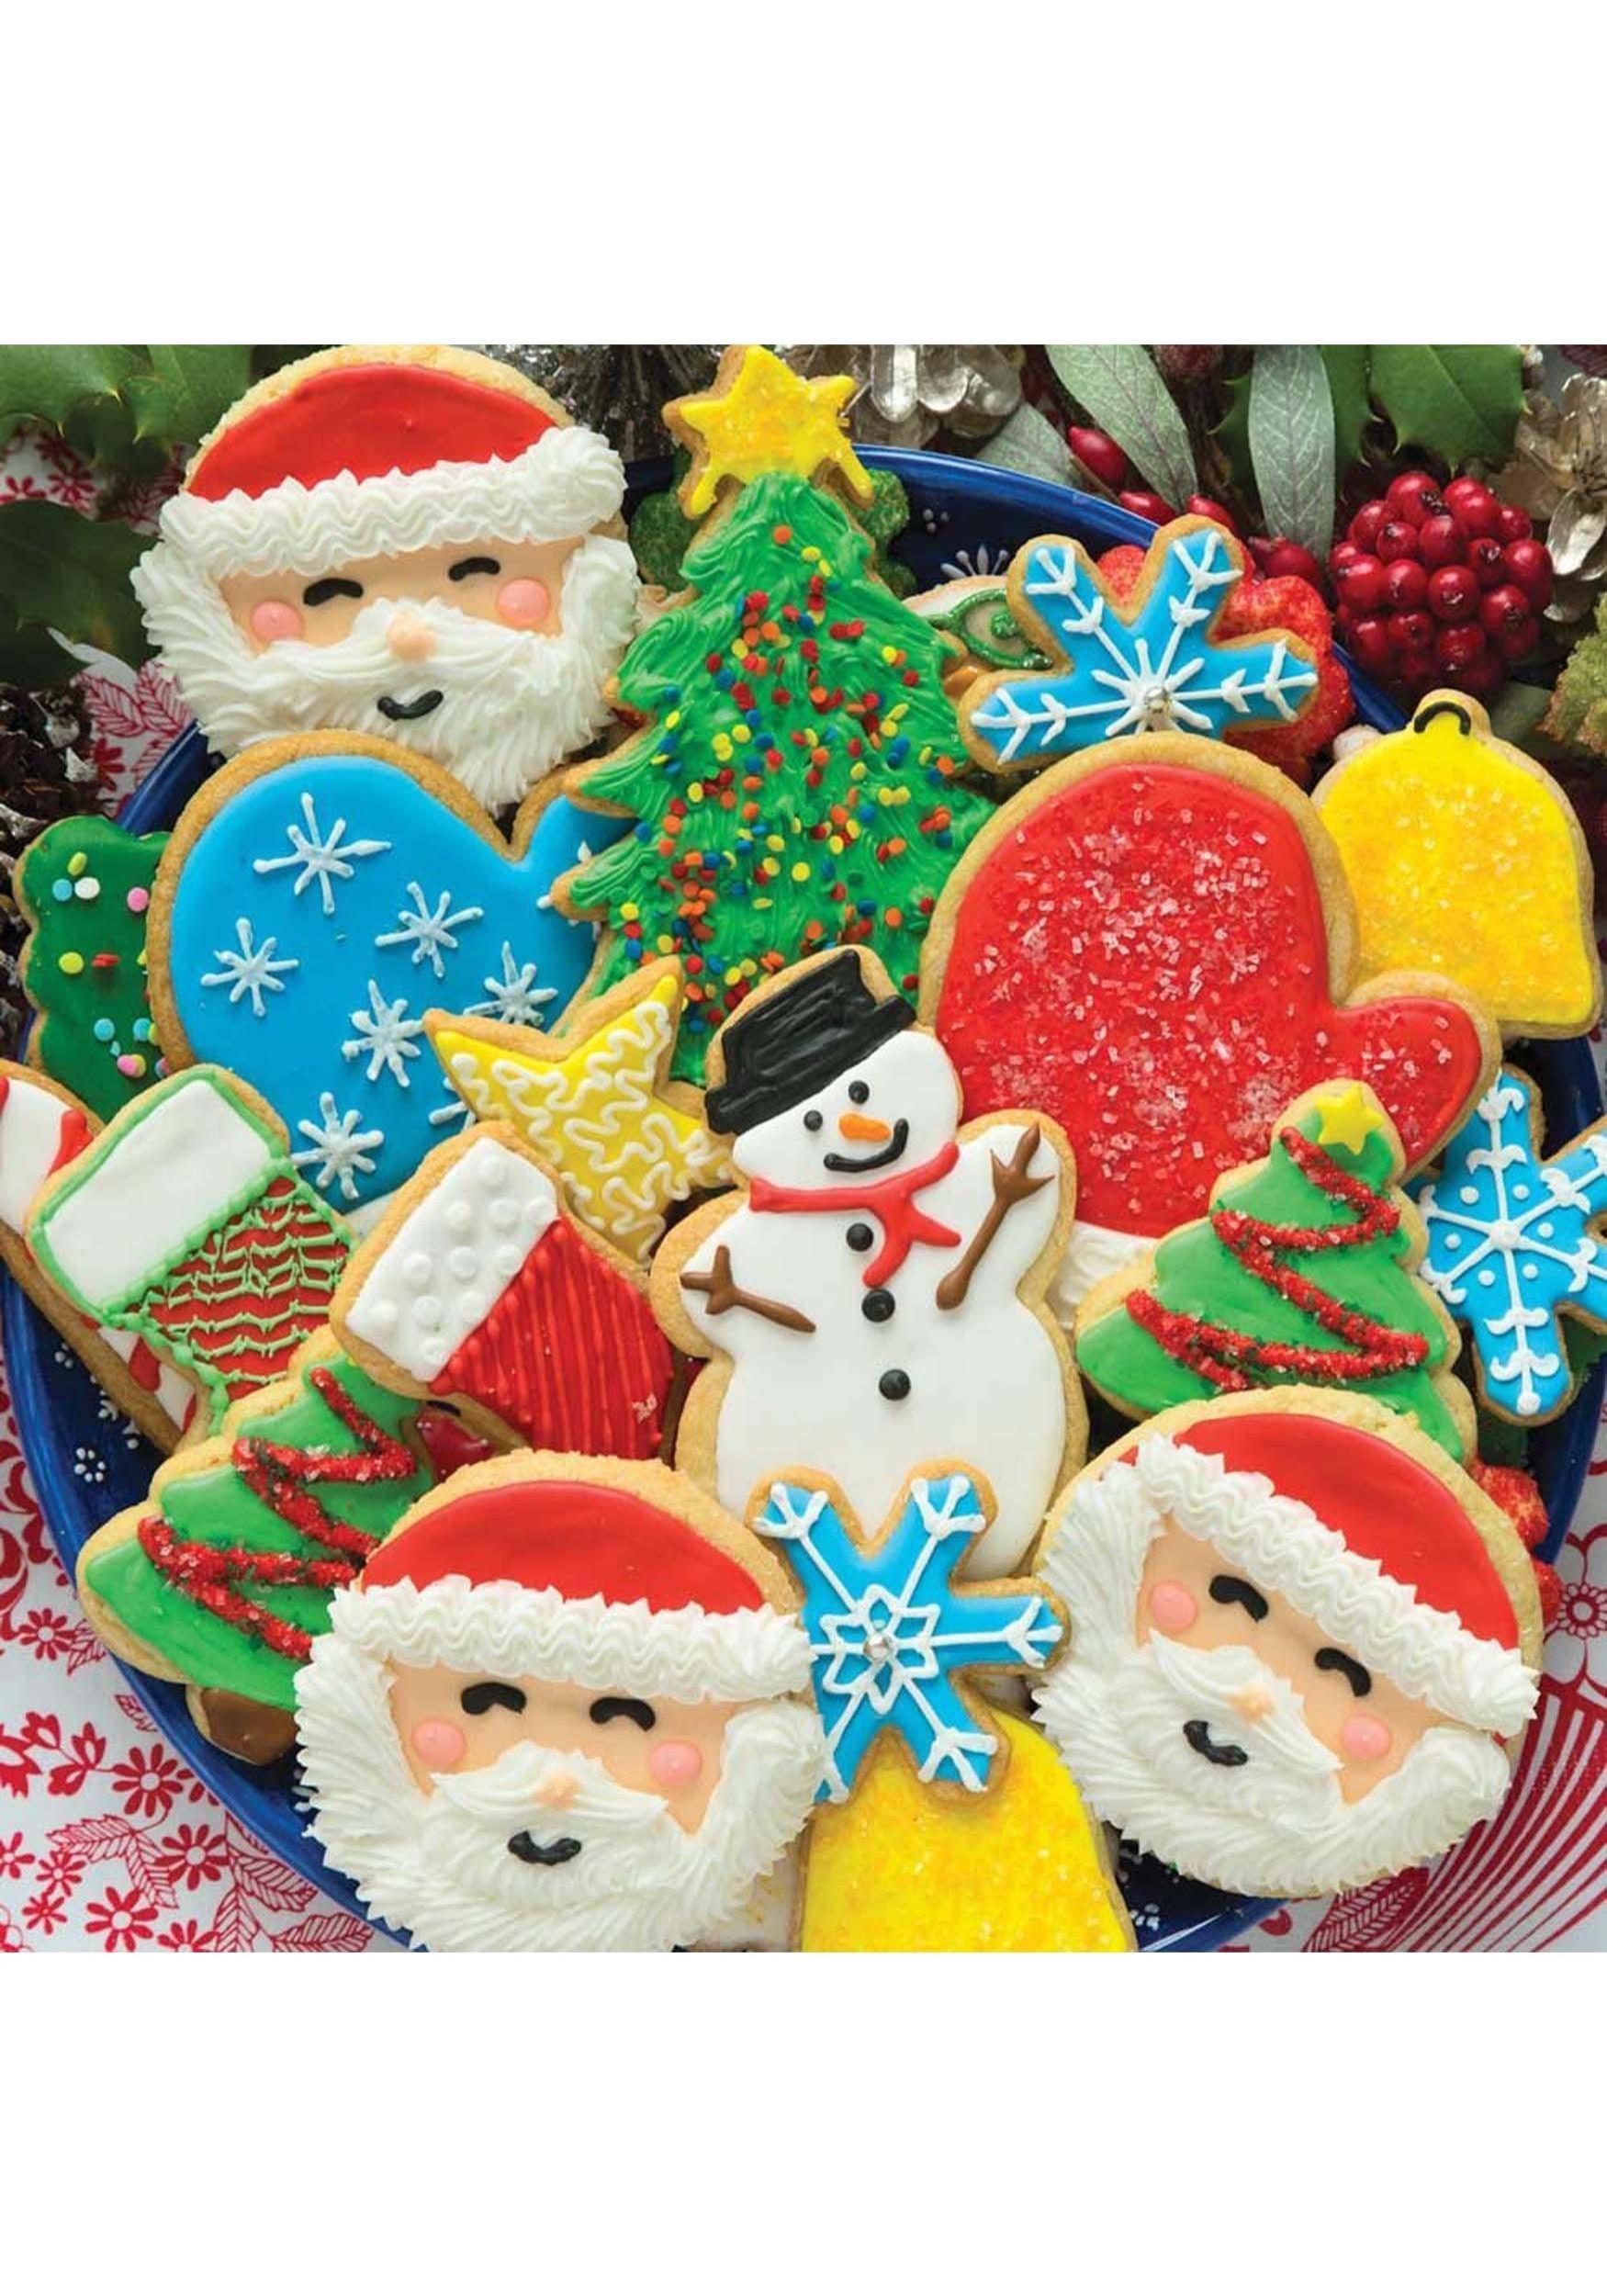 Cookies & Christmas 500 Piece Springbok Puzzle